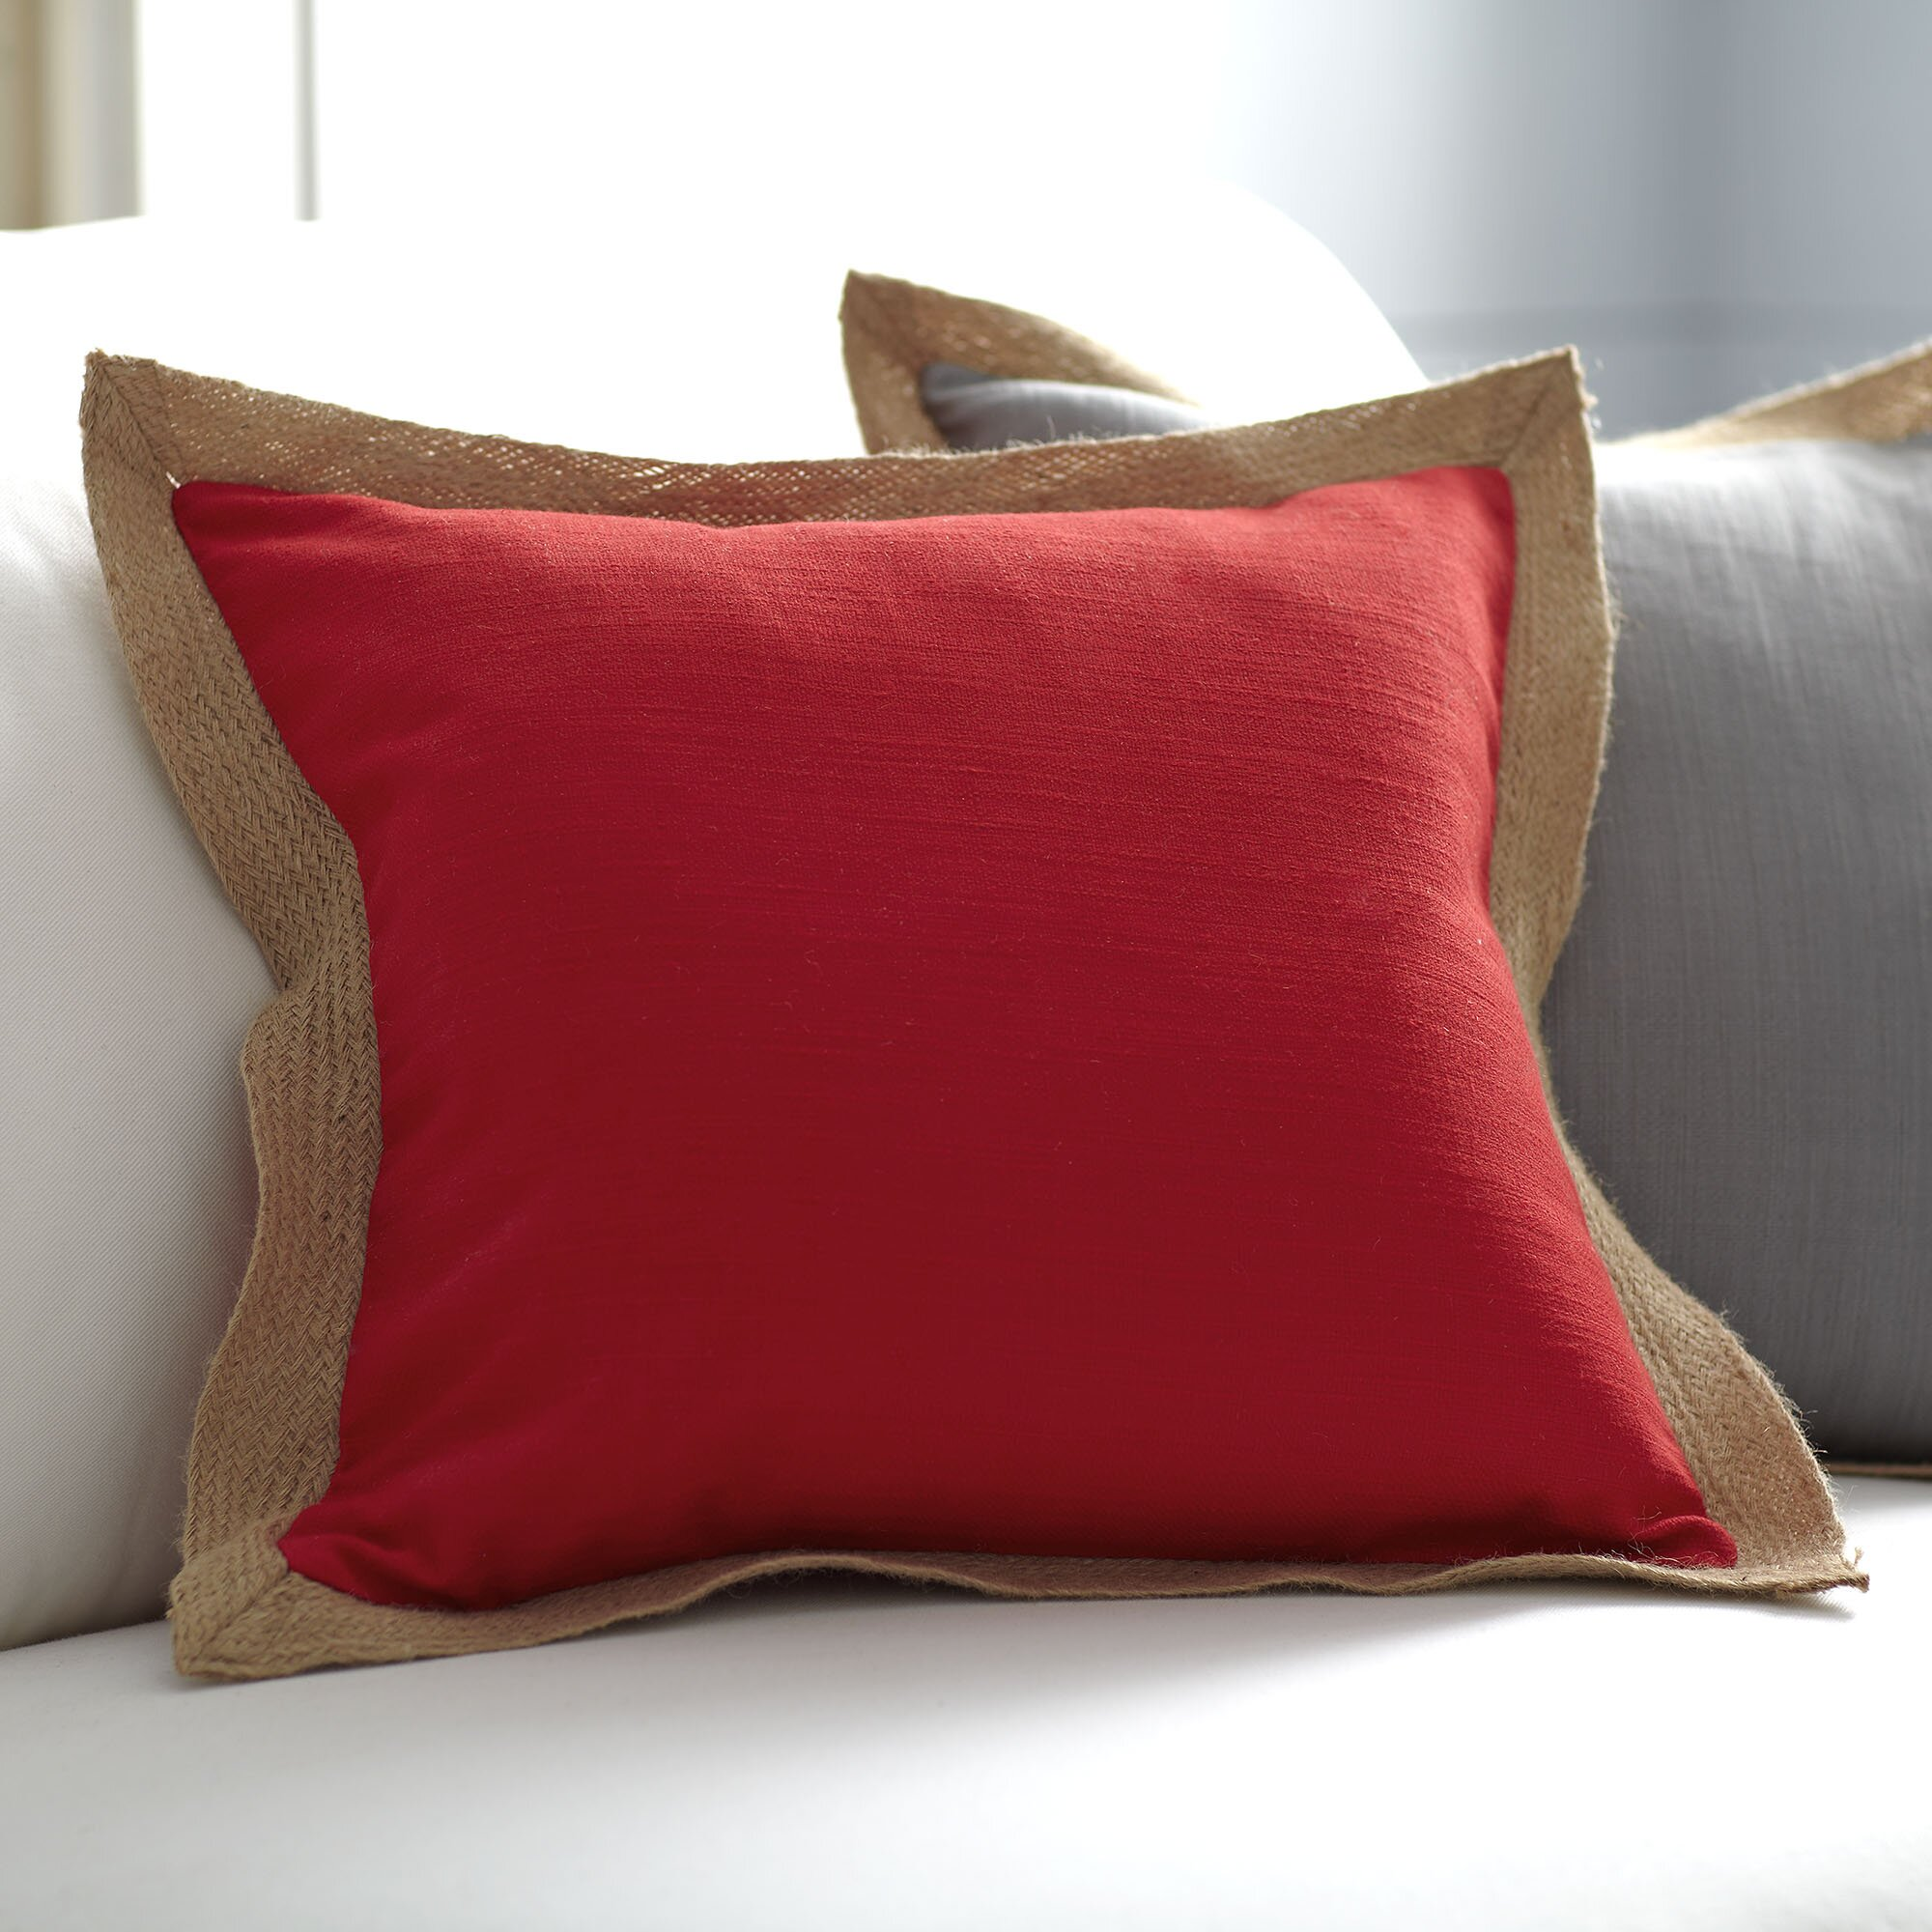 Jute Decorative Pillows : Birch Lane Cadence Jute Trim Pillow Cover & Reviews Wayfair